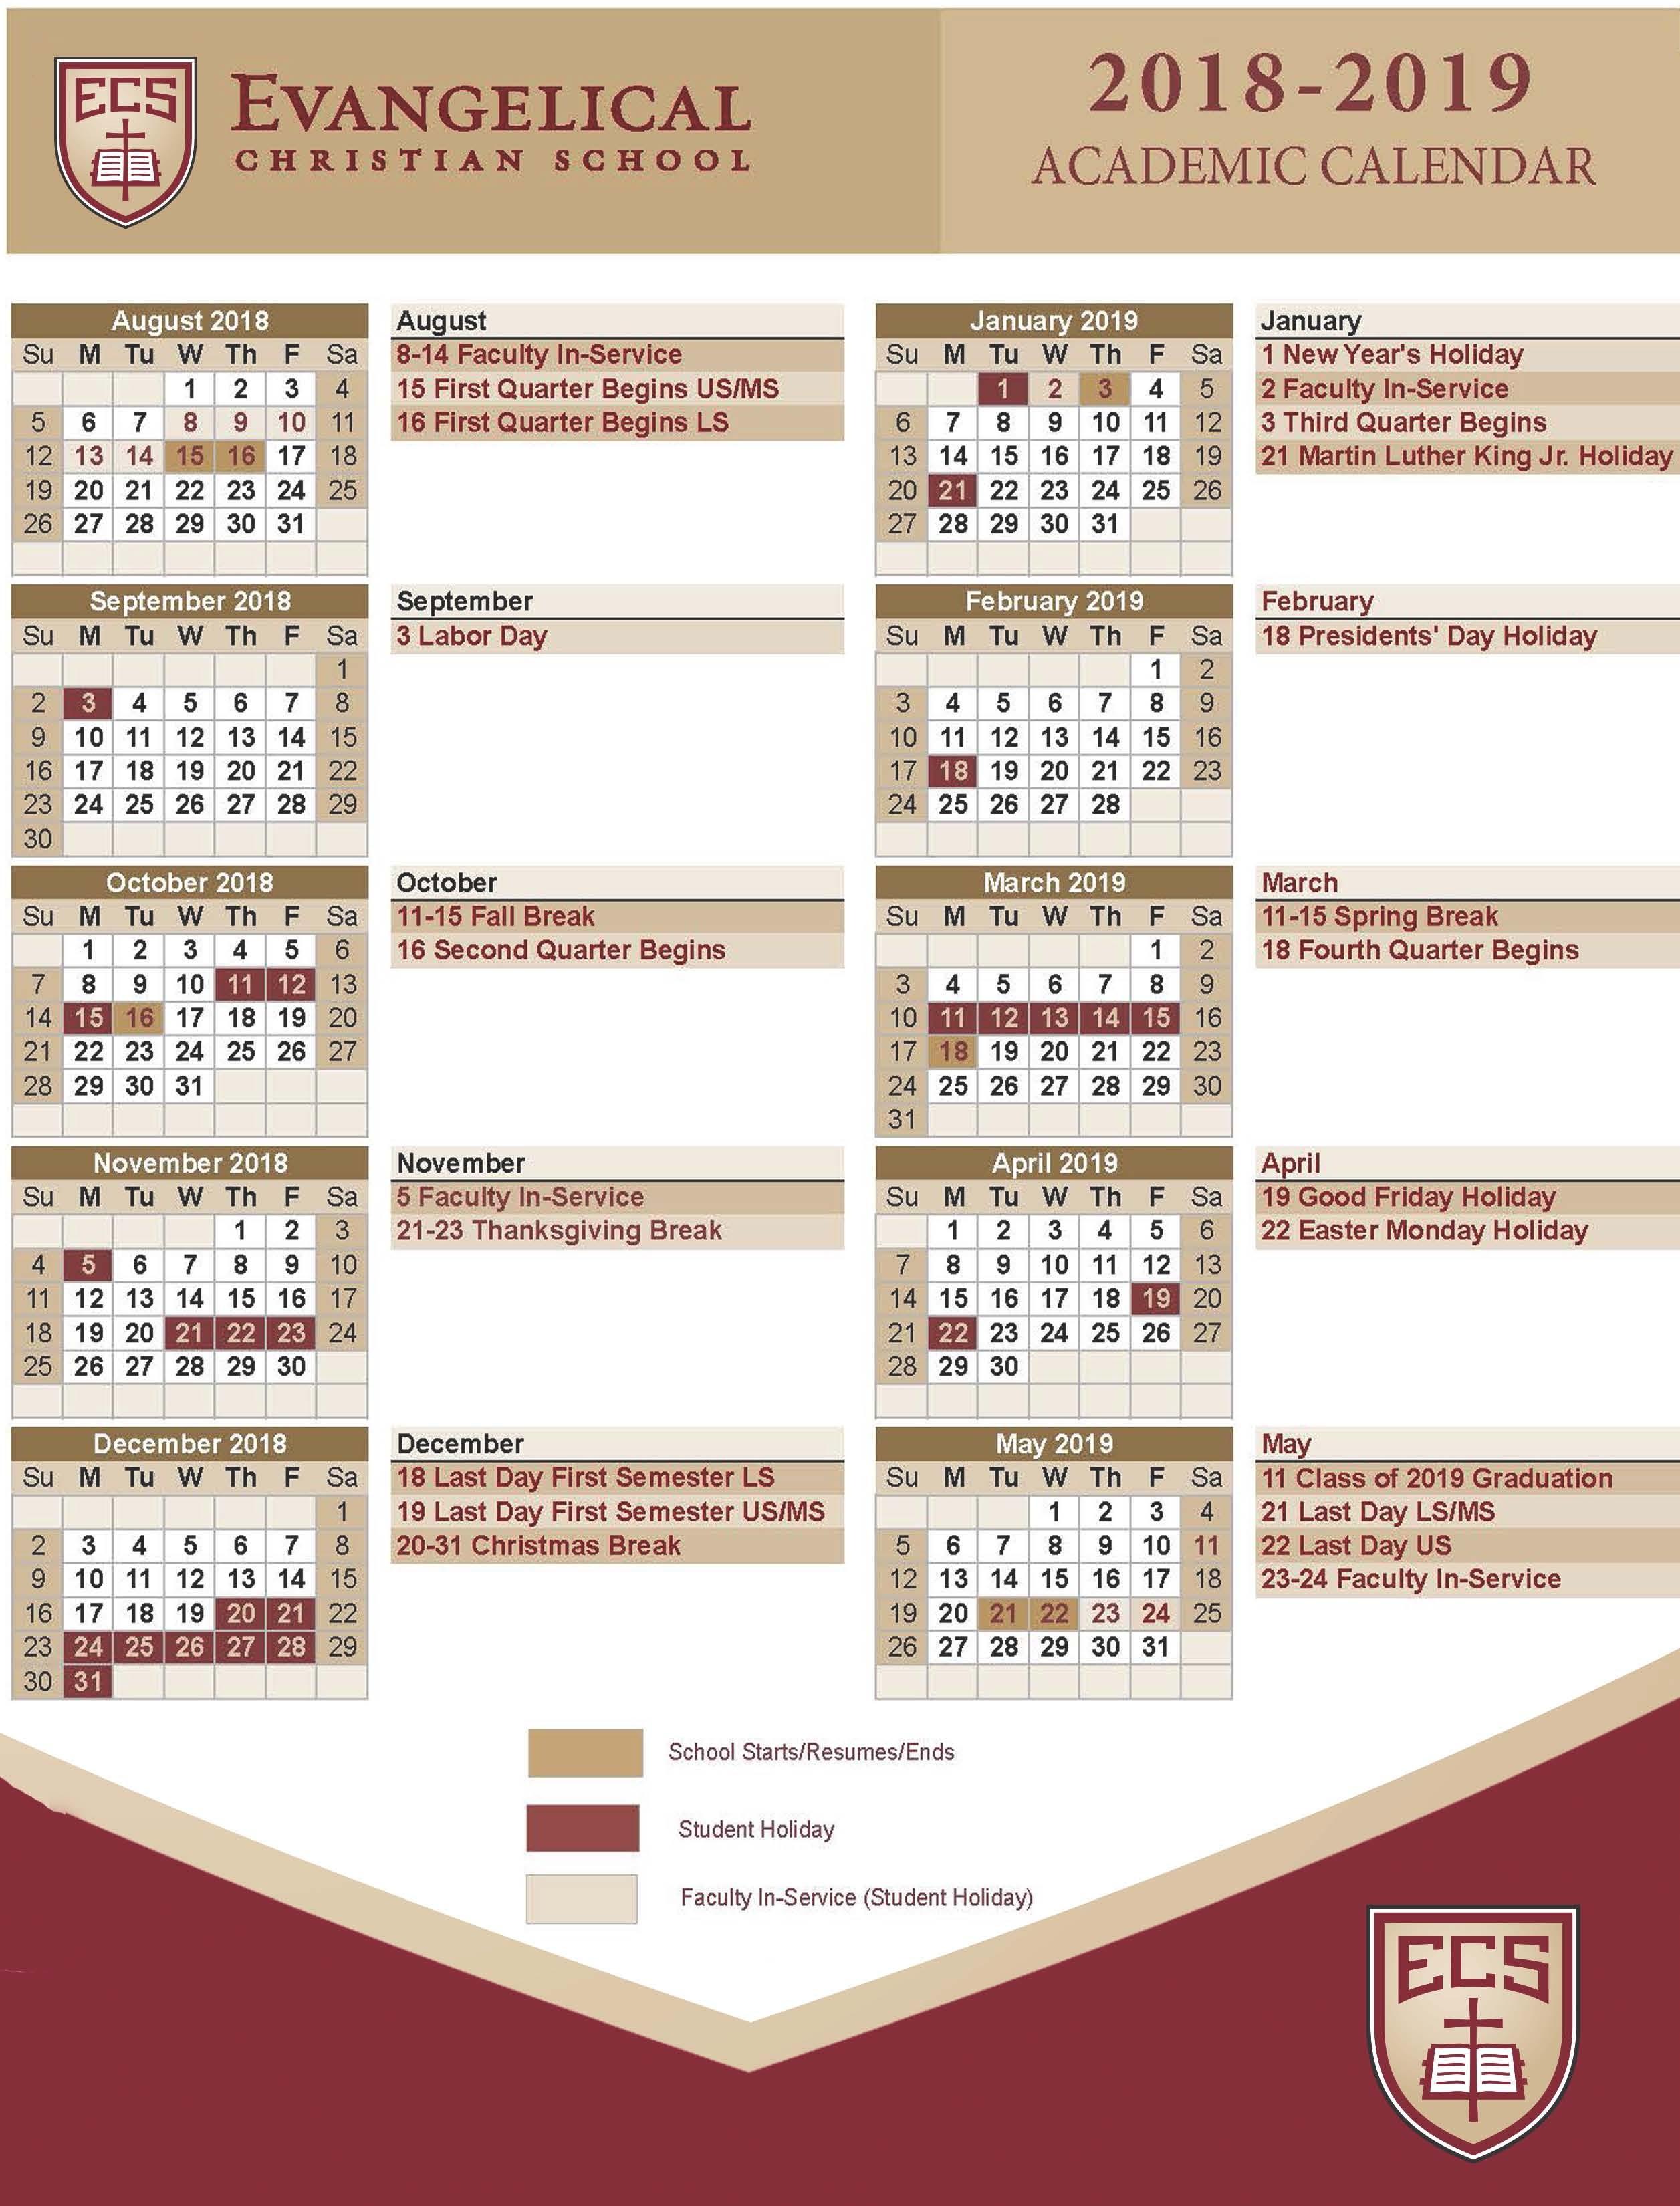 March Holiday Calendar 2019 Actual Calendars Evangelical Christian School Of March Holiday Calendar 2019 Más Caliente Printable March 2019 Calendar Template Holidays Yes Calendars